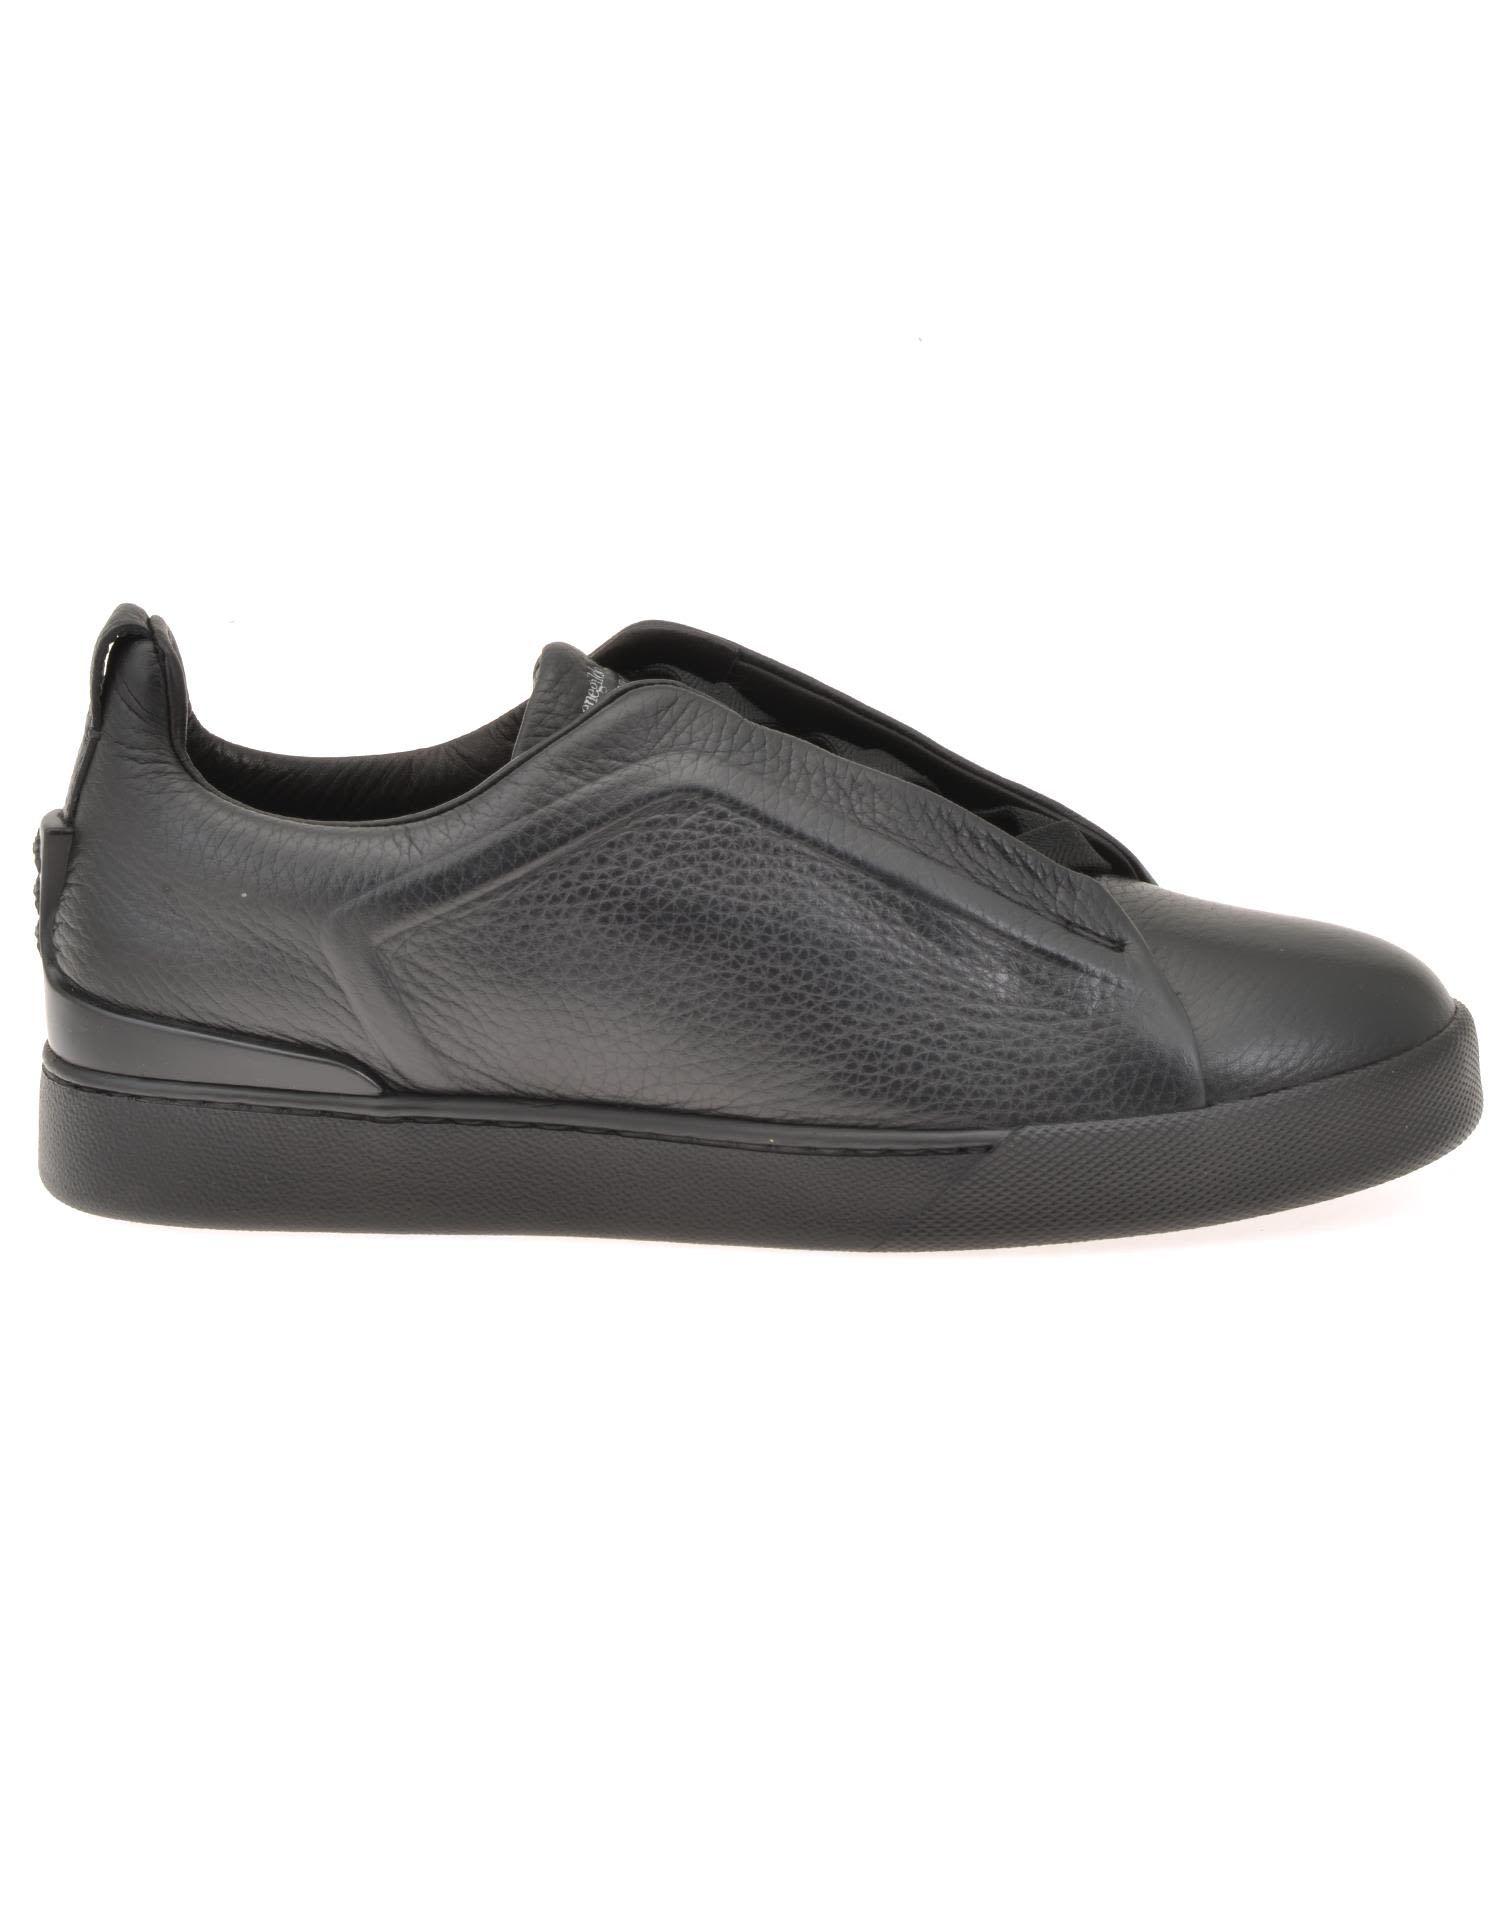 Daim, Cuir Et Mesh Techmerino Slip-on Chaussures De Sport - Marine Ermenegildo Zegna